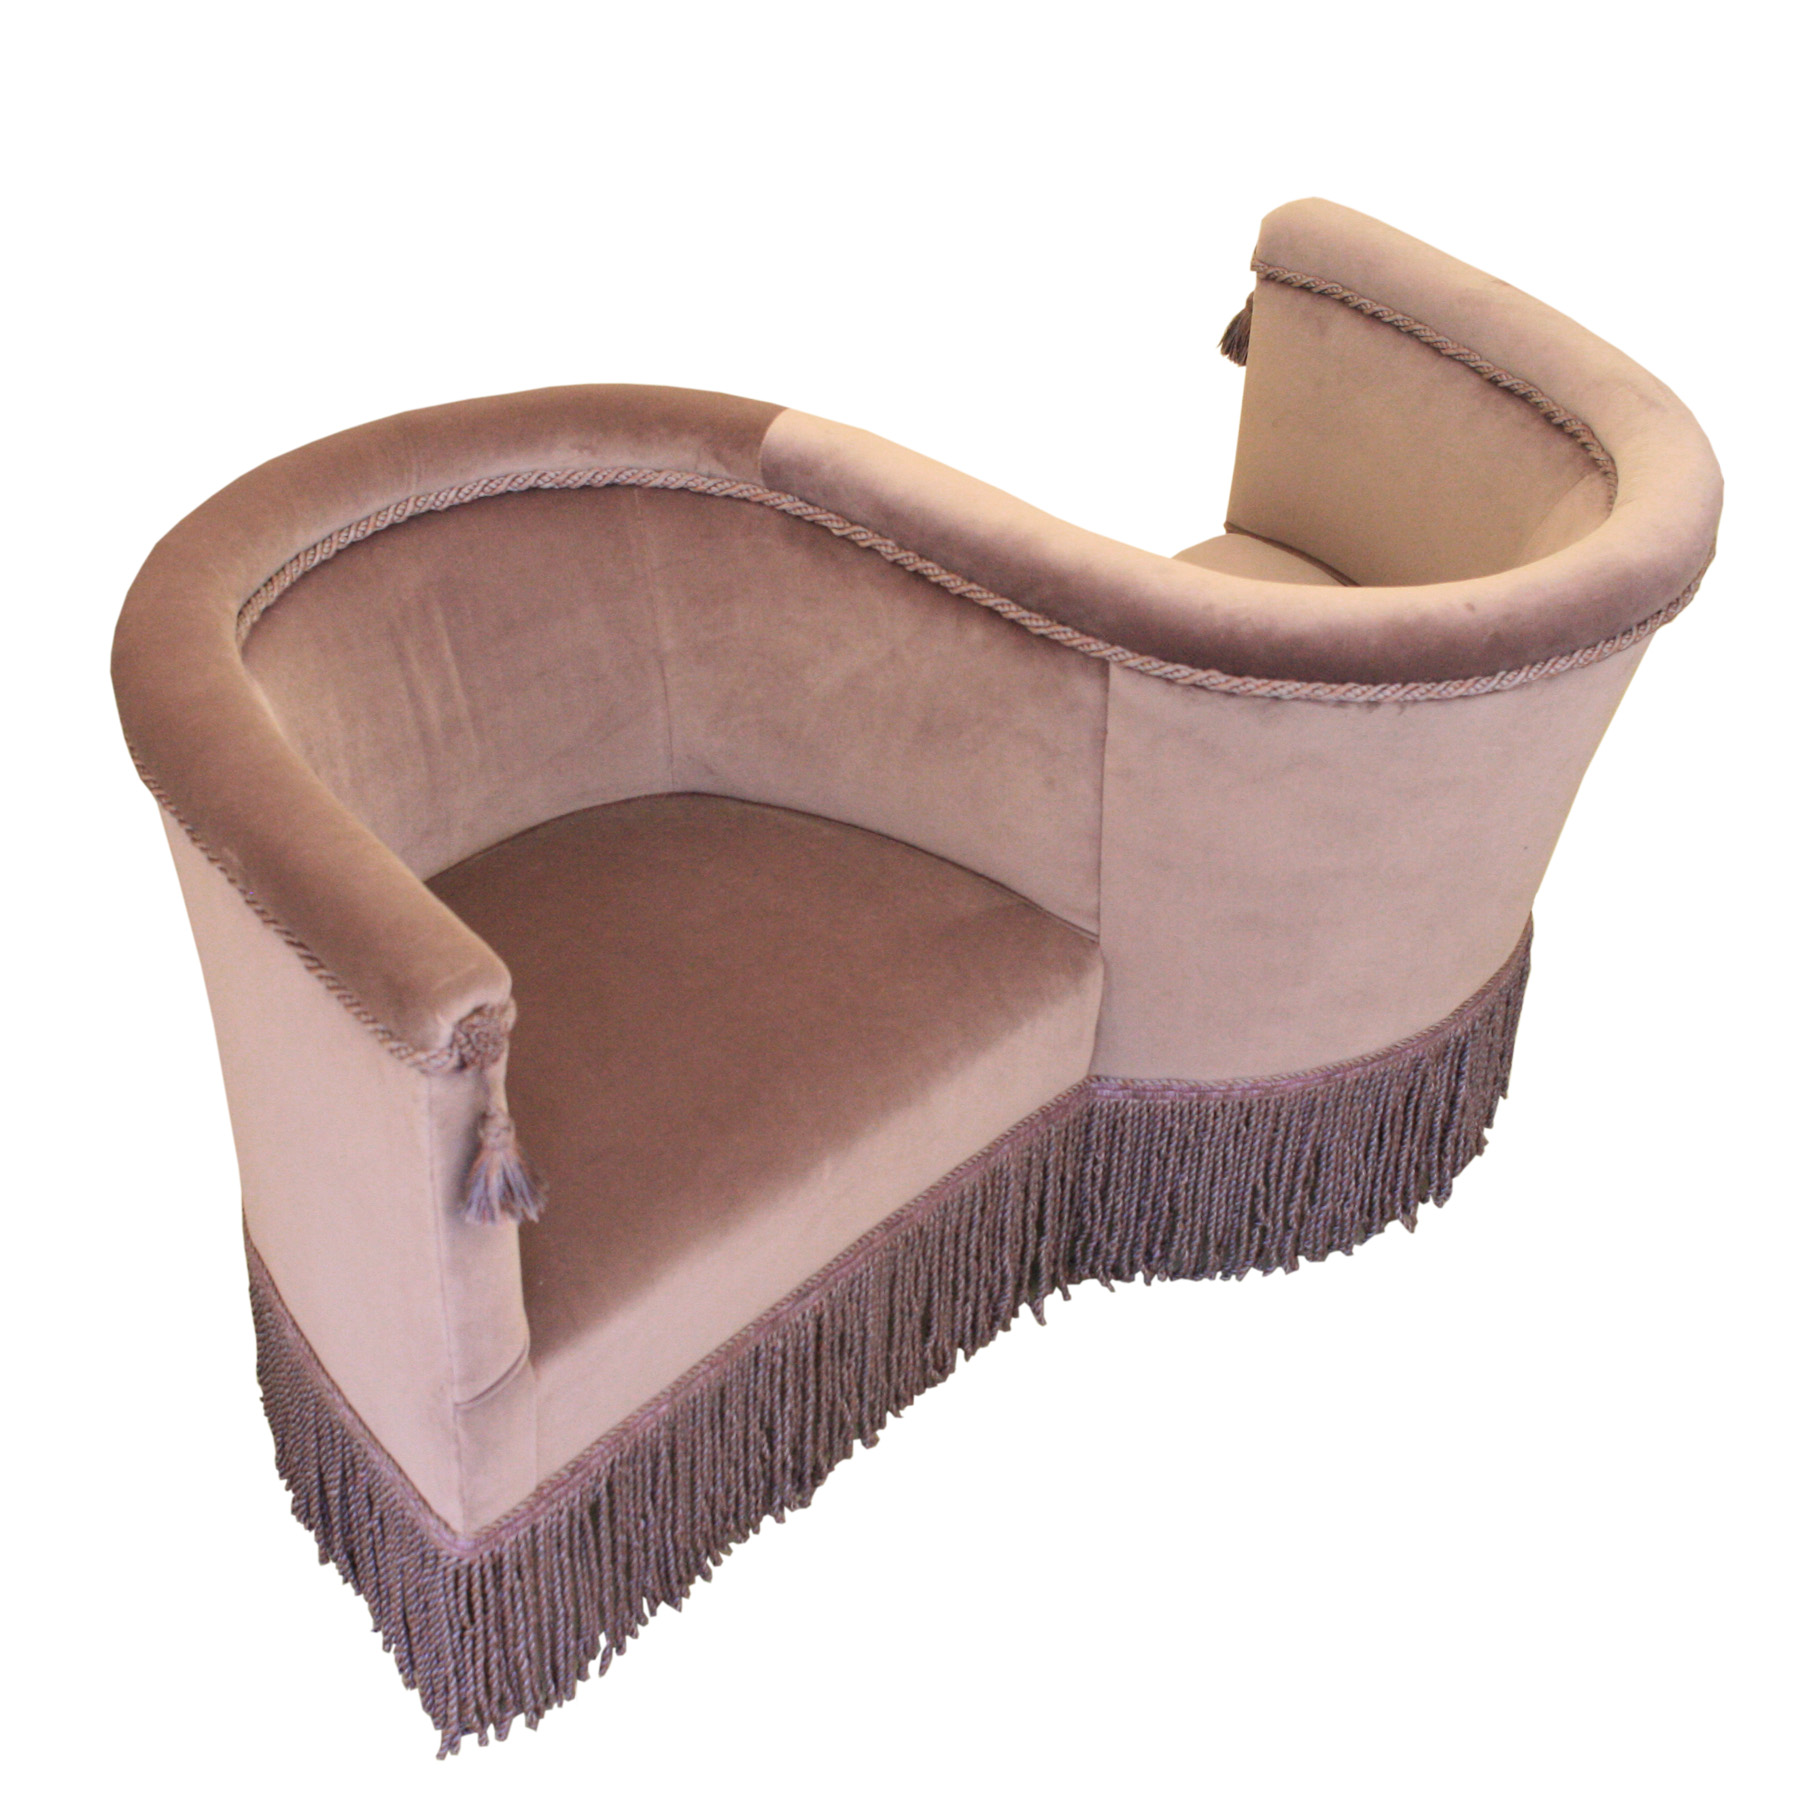 the love chair wheelchair glee by vincenzo menegatti modernism